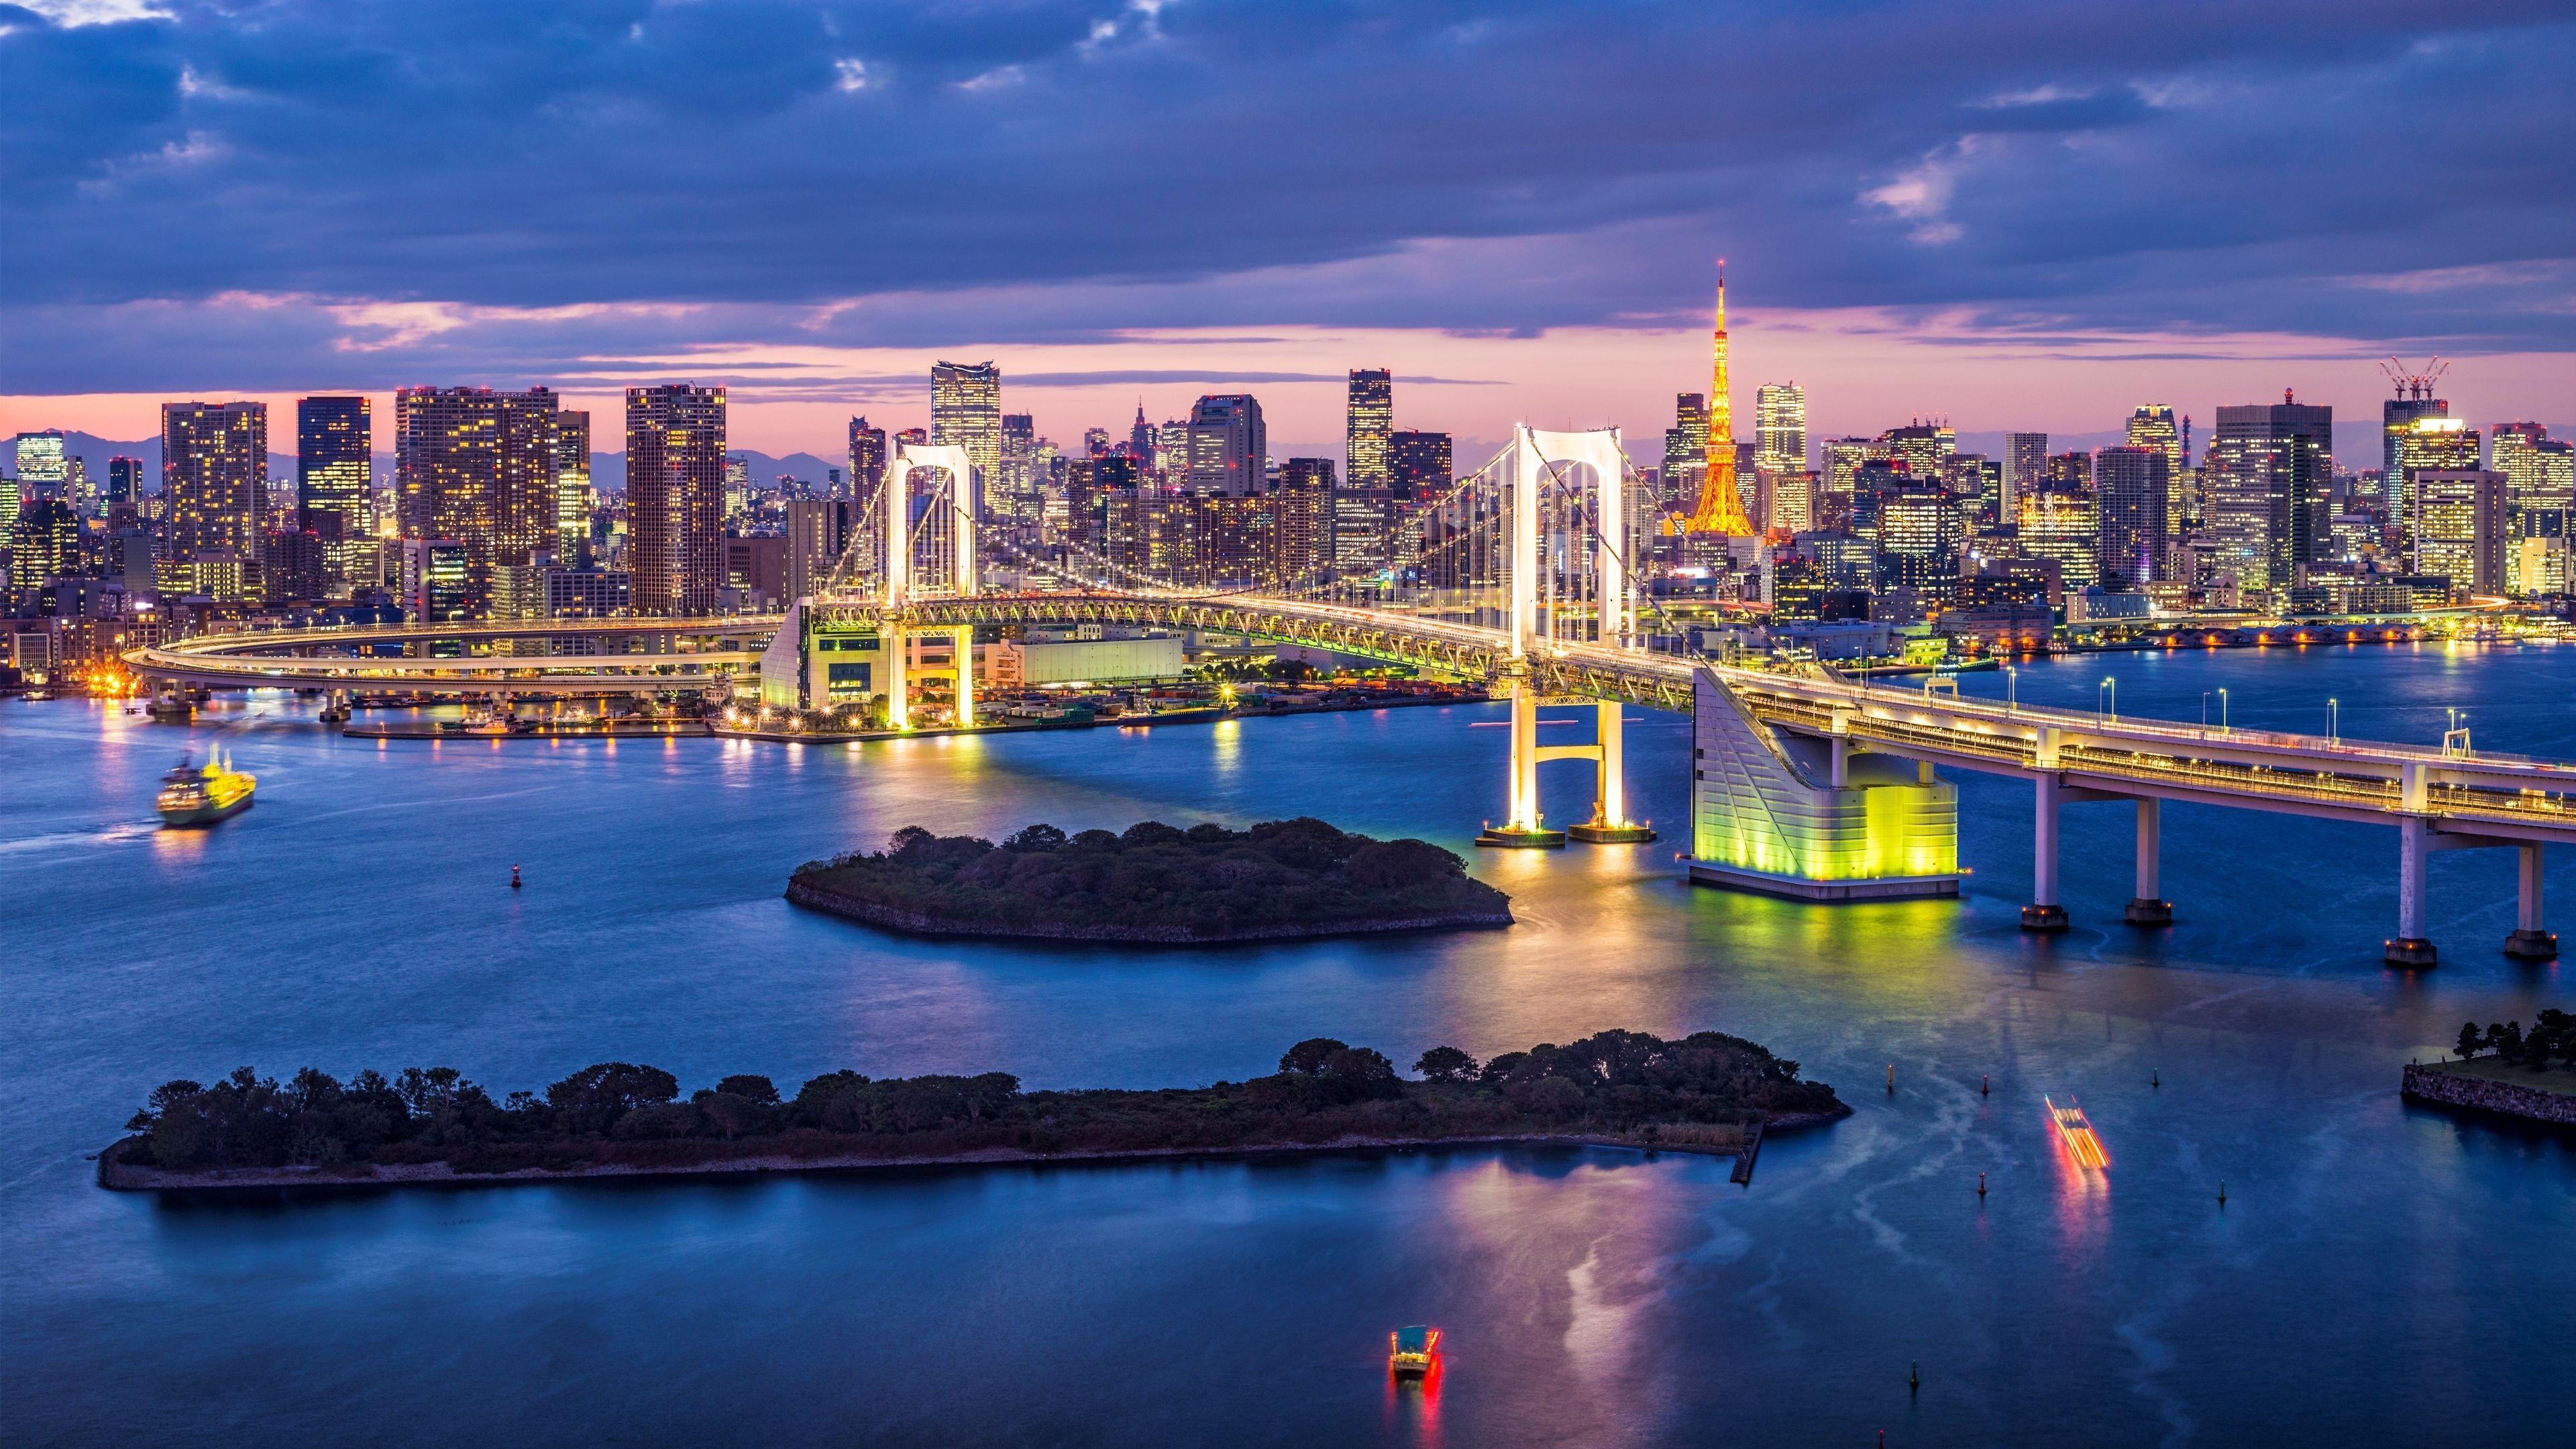 Tokyo Future 4K Wallpapers - Top Free Tokyo Future 4K ...